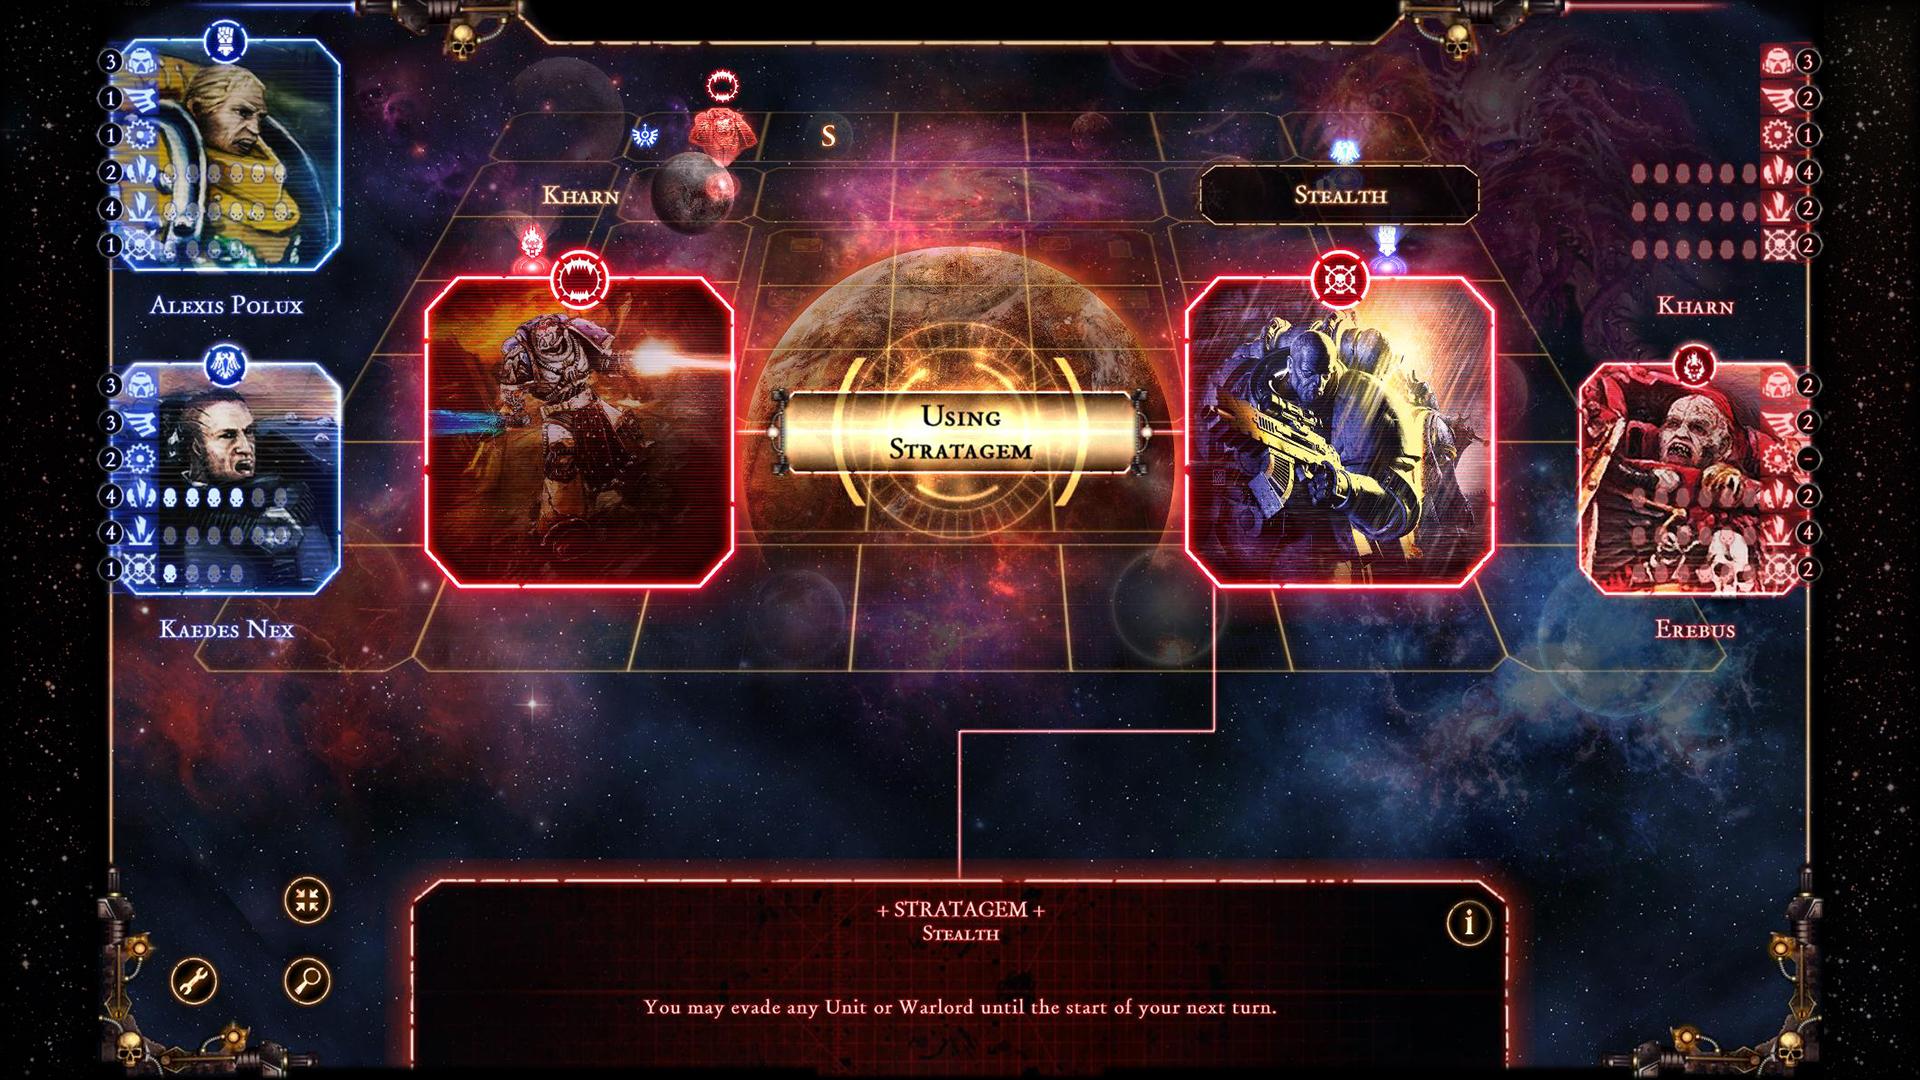 Warhammer 40k Makes Talisman The Horus Heresy A True Digital Board Game Venturebeat